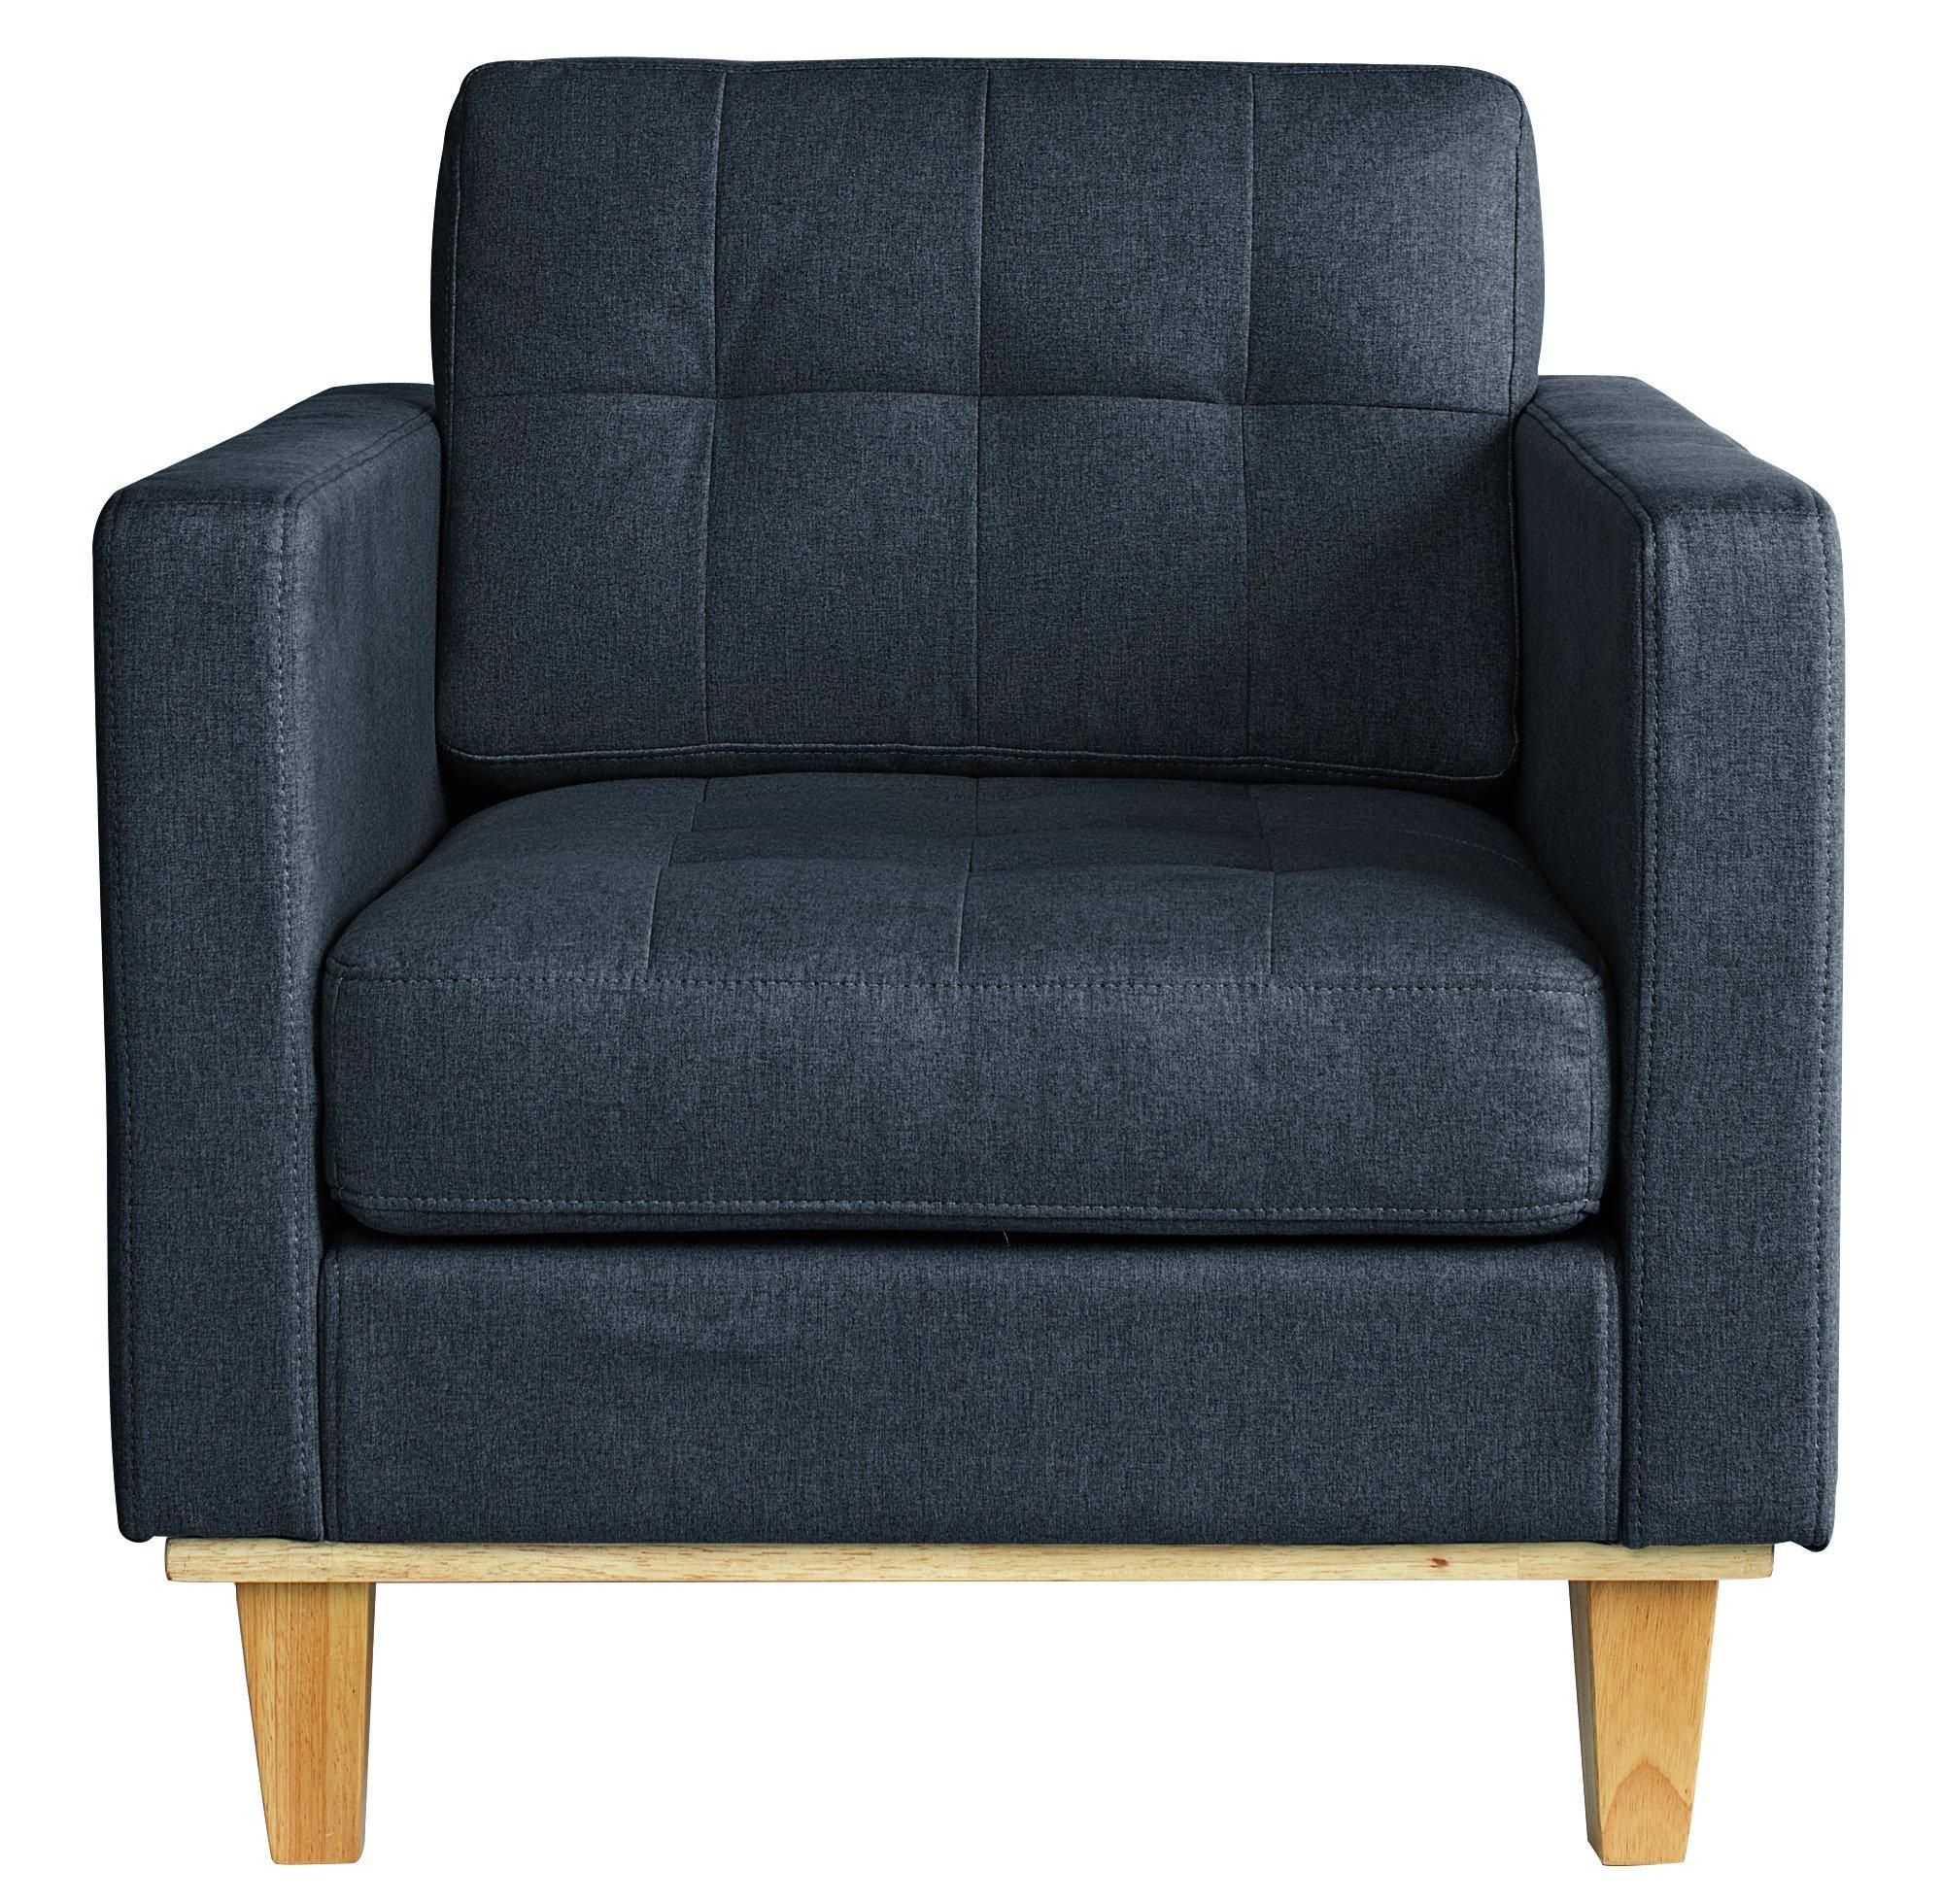 Argos Home Aliso Fabric Chair - Denim Blue